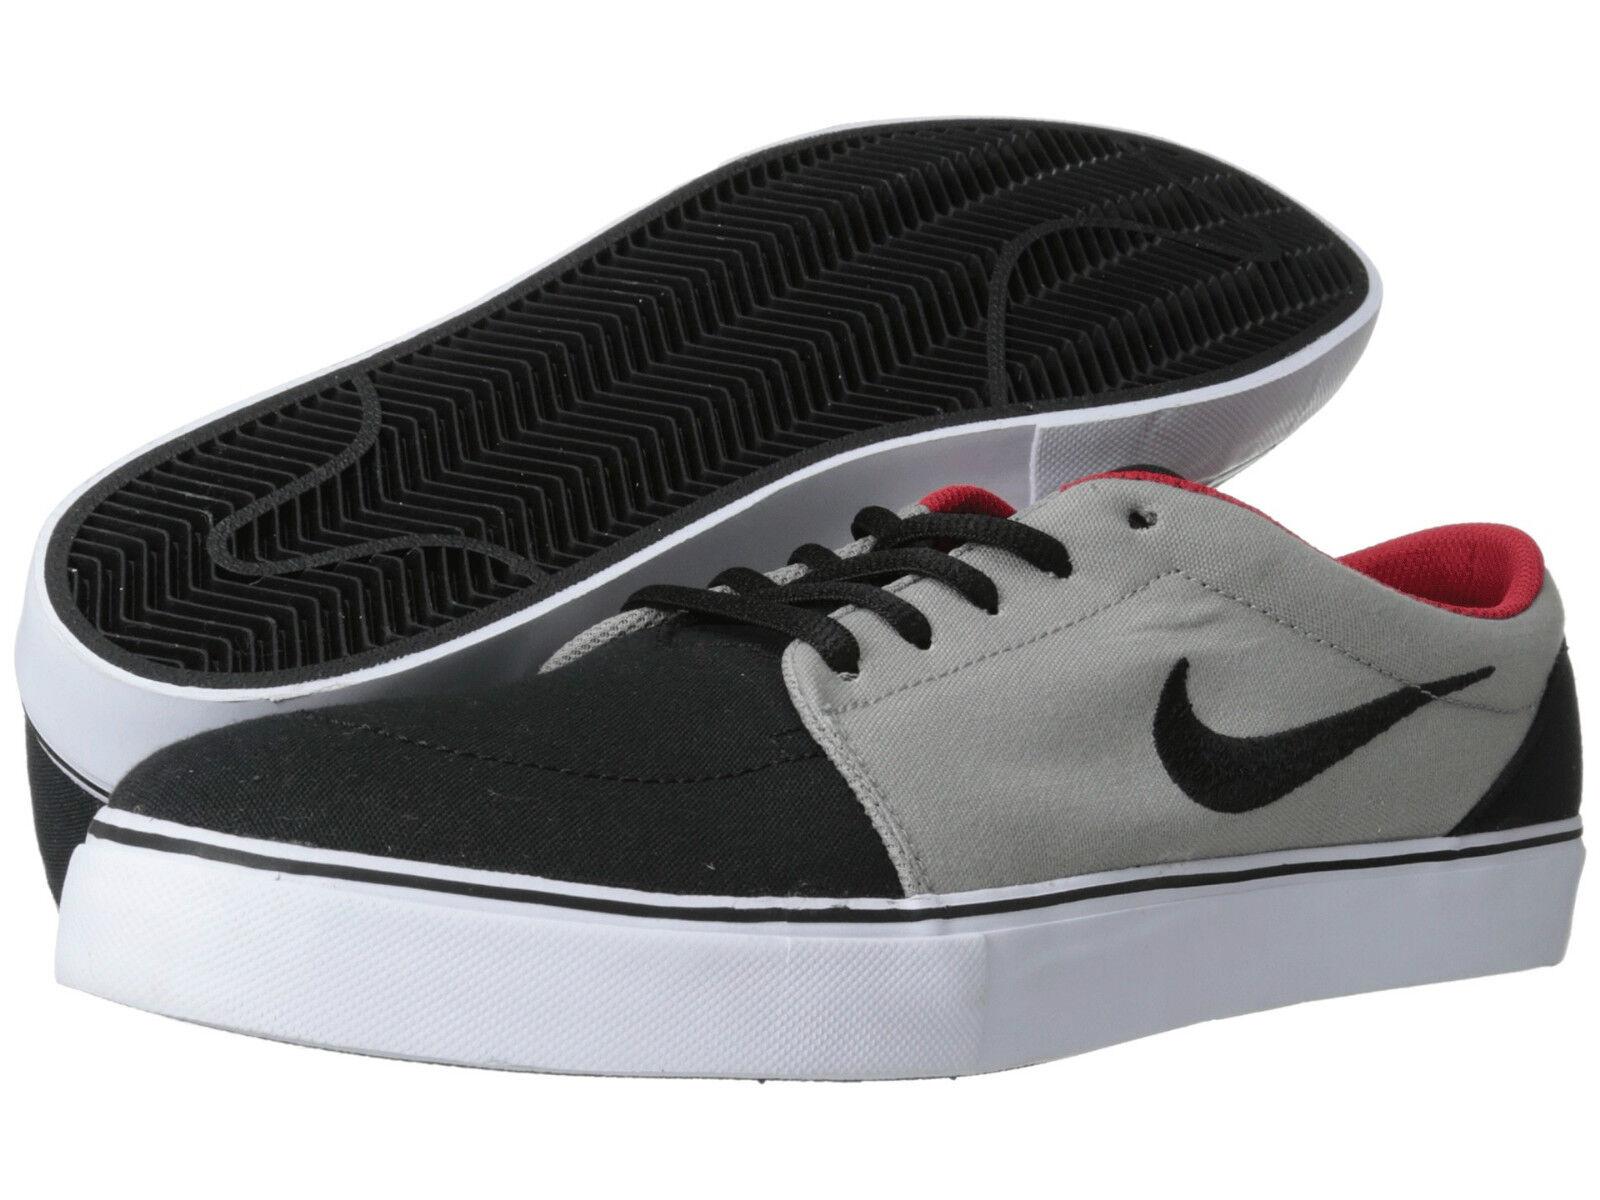 New Men's Nike SB Satire Canvas-  Grey University Red White Black - Size 13